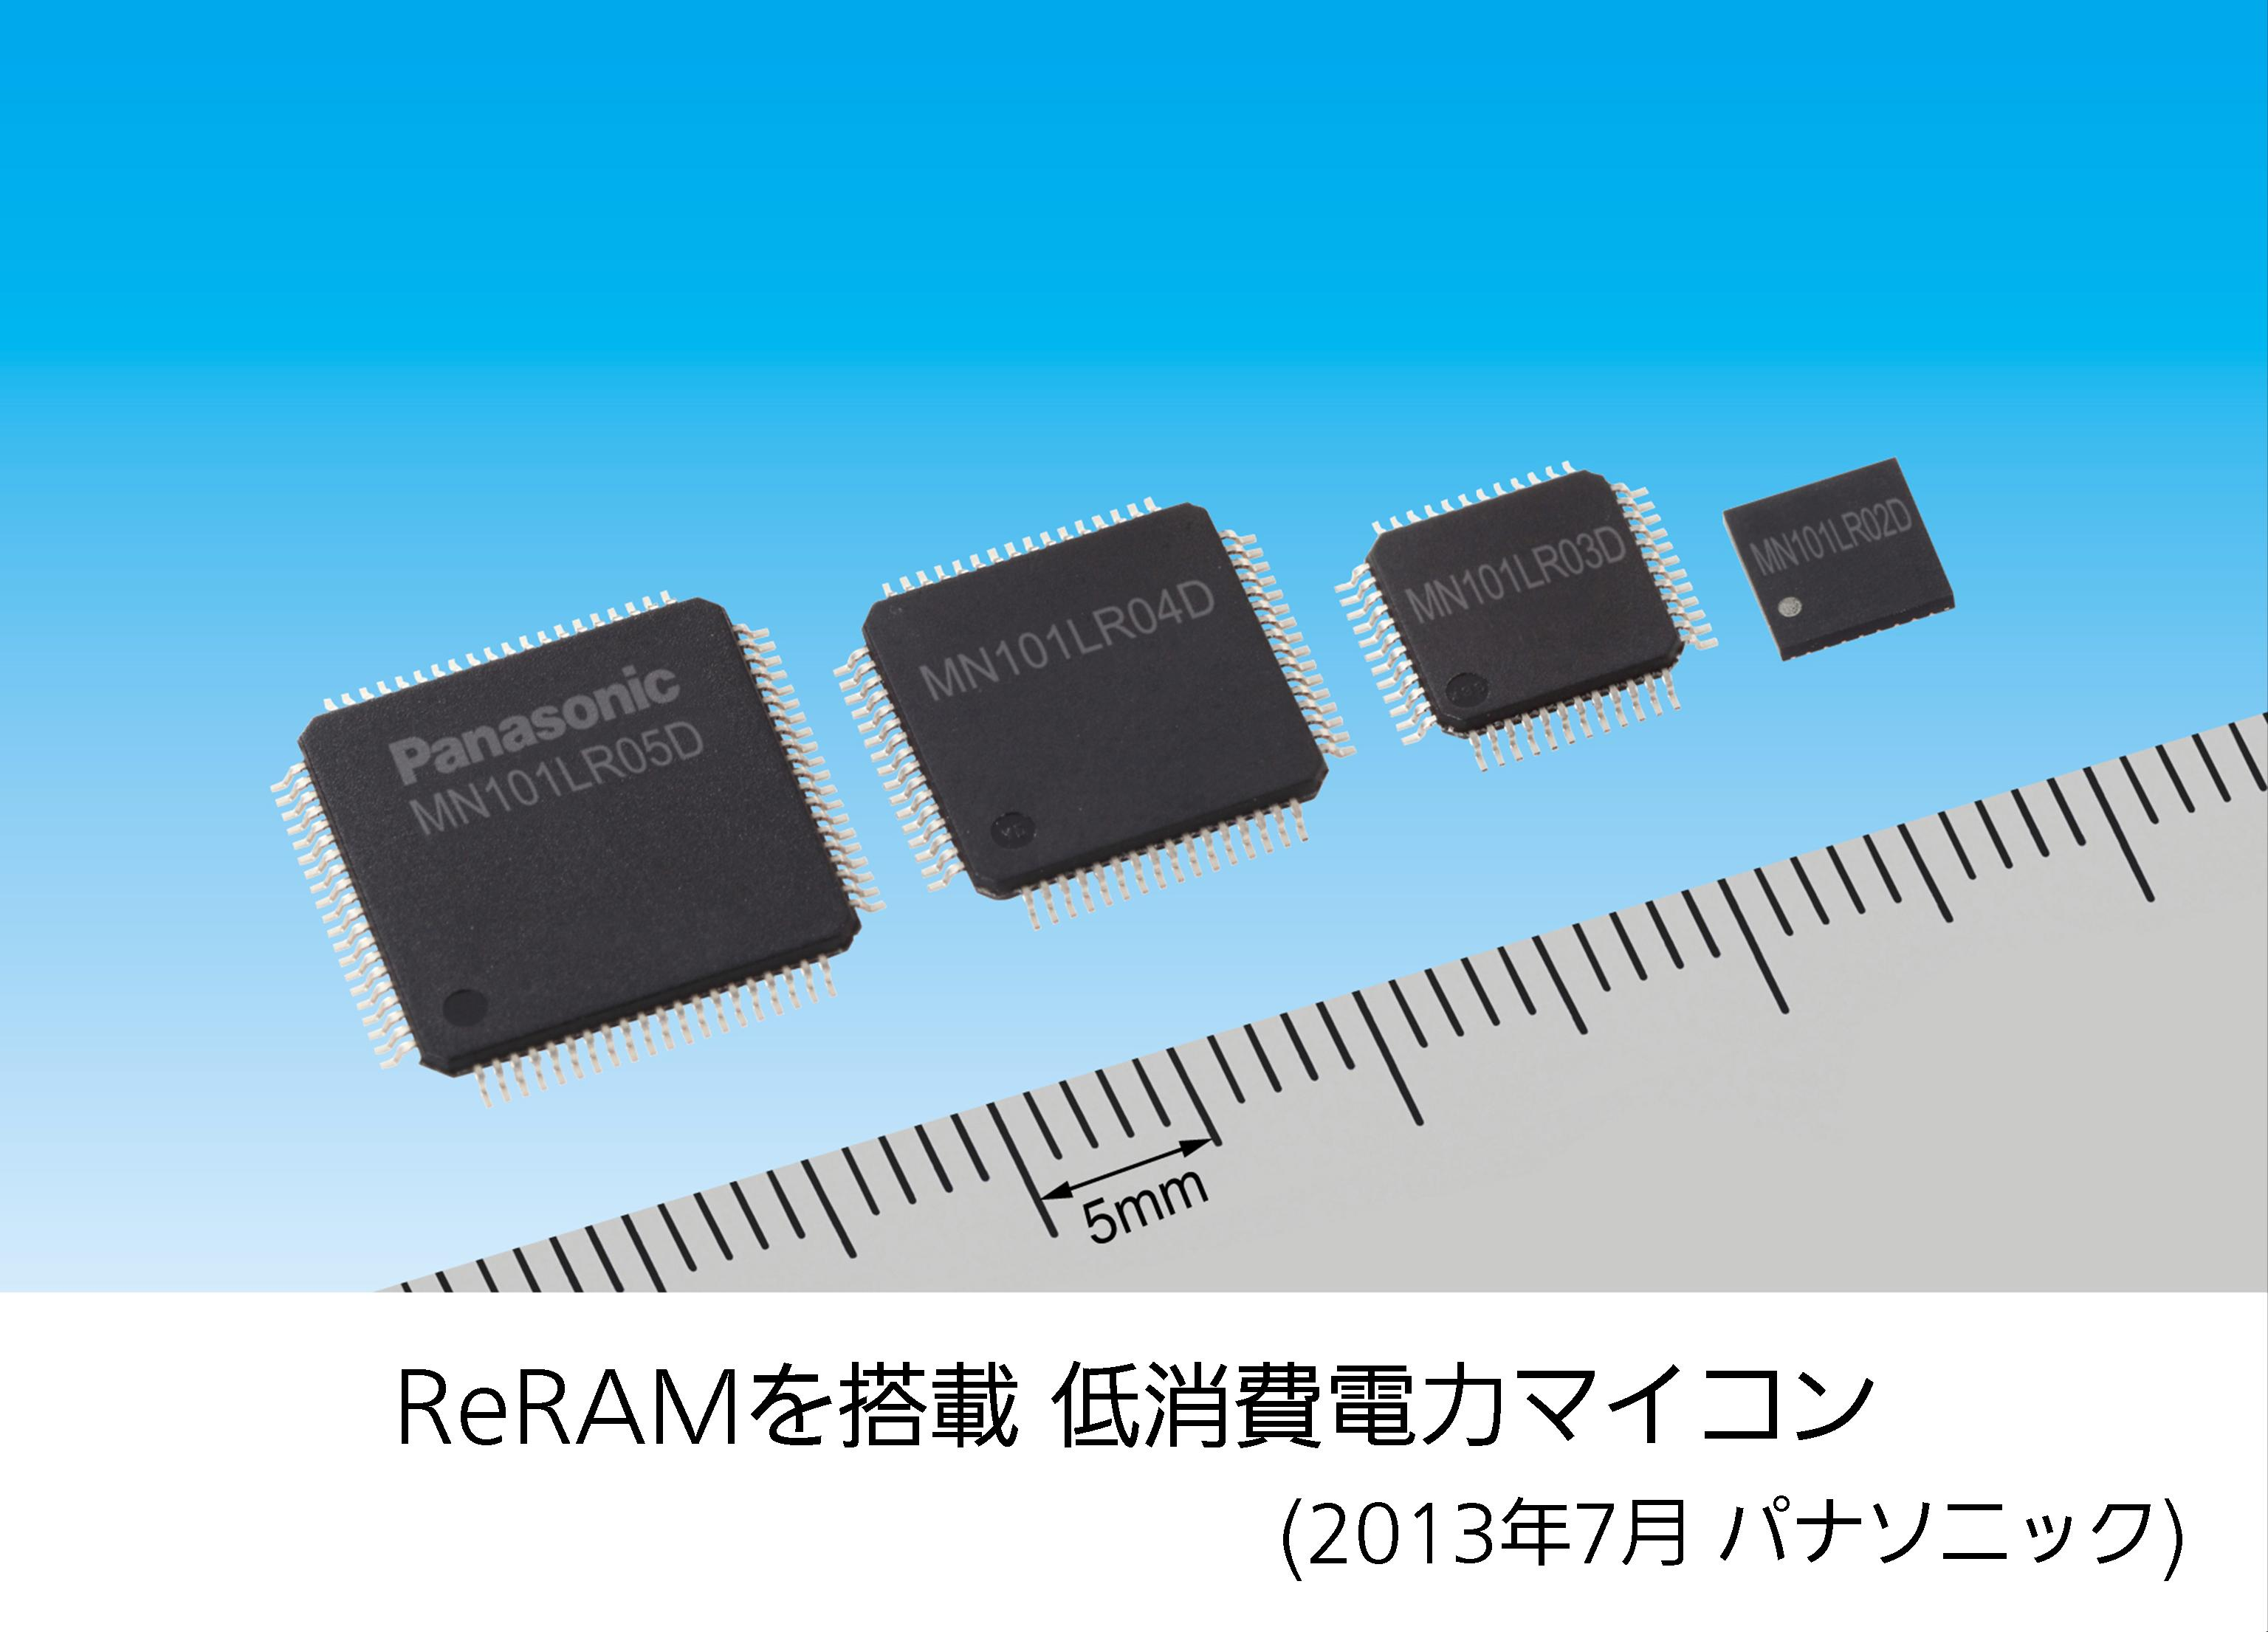 ReRAMを搭載 低消費電力マイコン